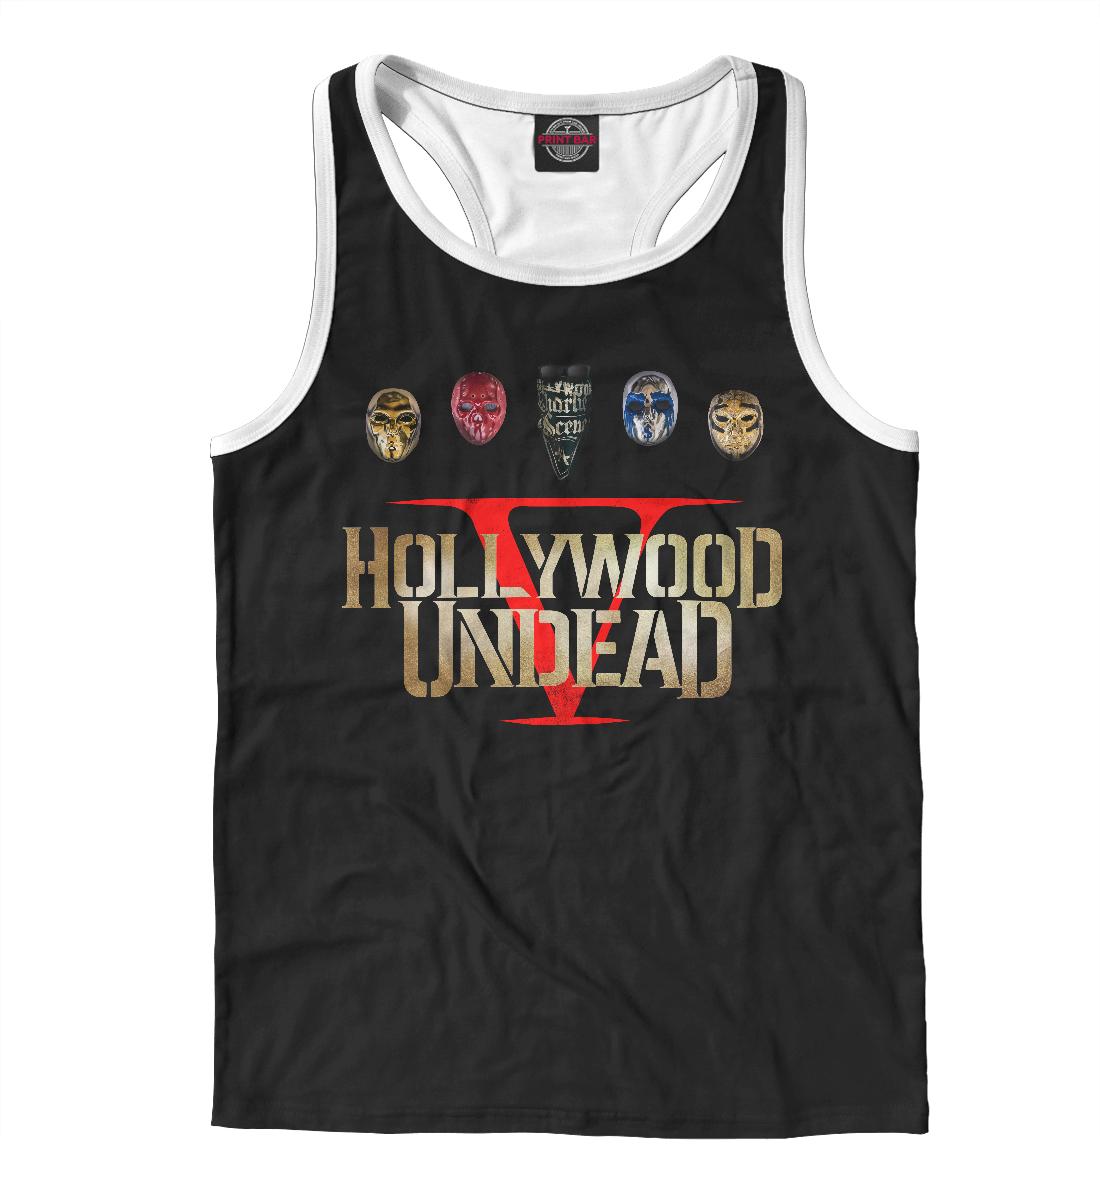 Купить Hollywood Undead Five, Printbar, Майки борцовки, HLW-274579-mayb-2